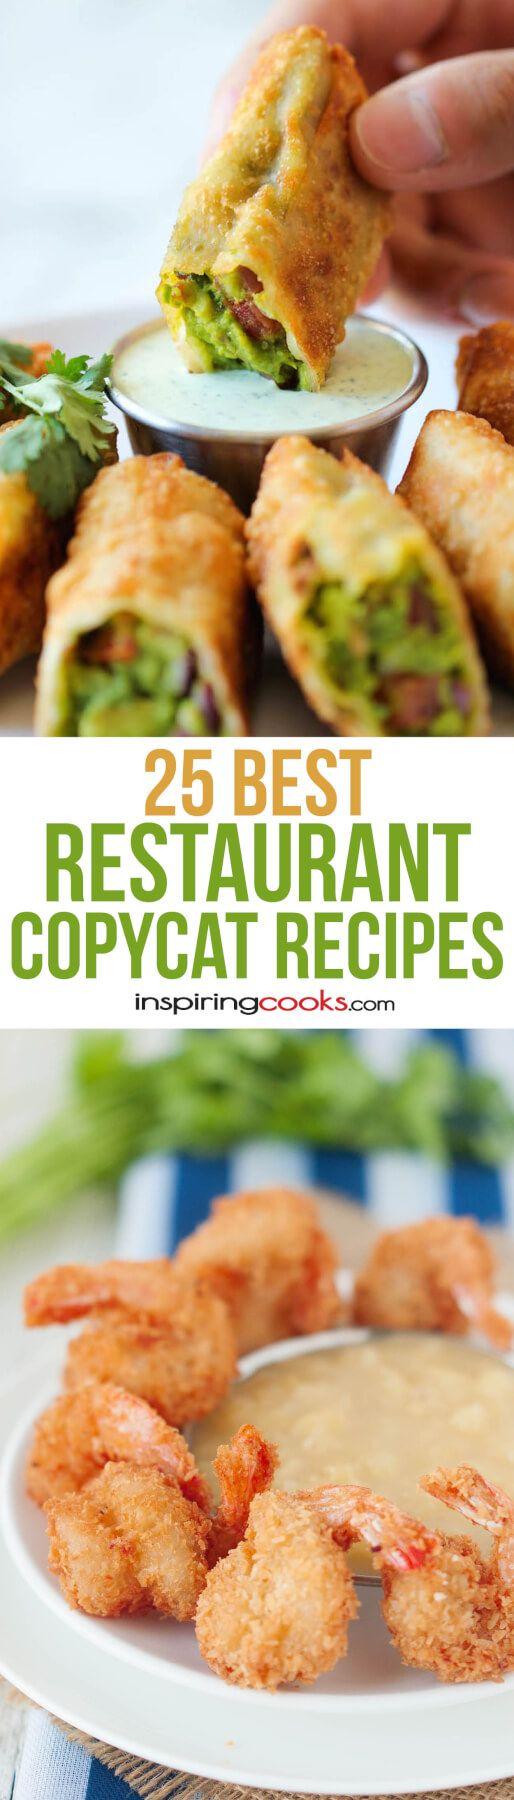 25 of the Best Restaurant Copycat Recipes on Pinterest